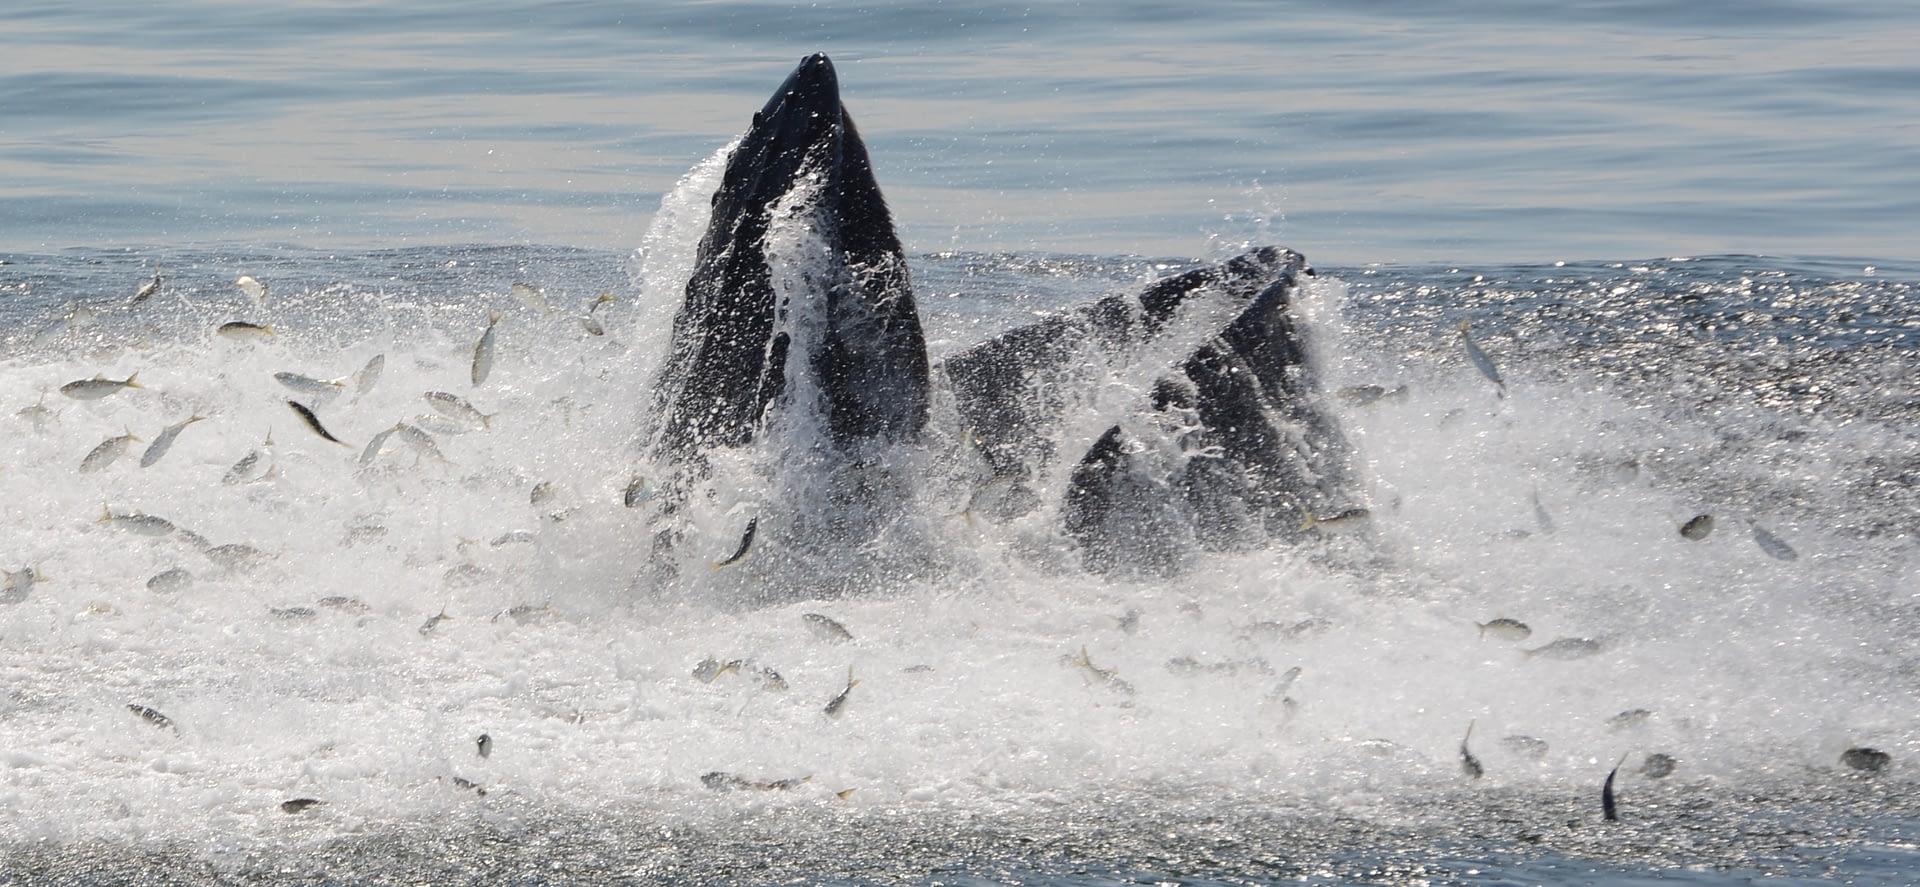 Humpback Whale 17 lunge feeding on bunker